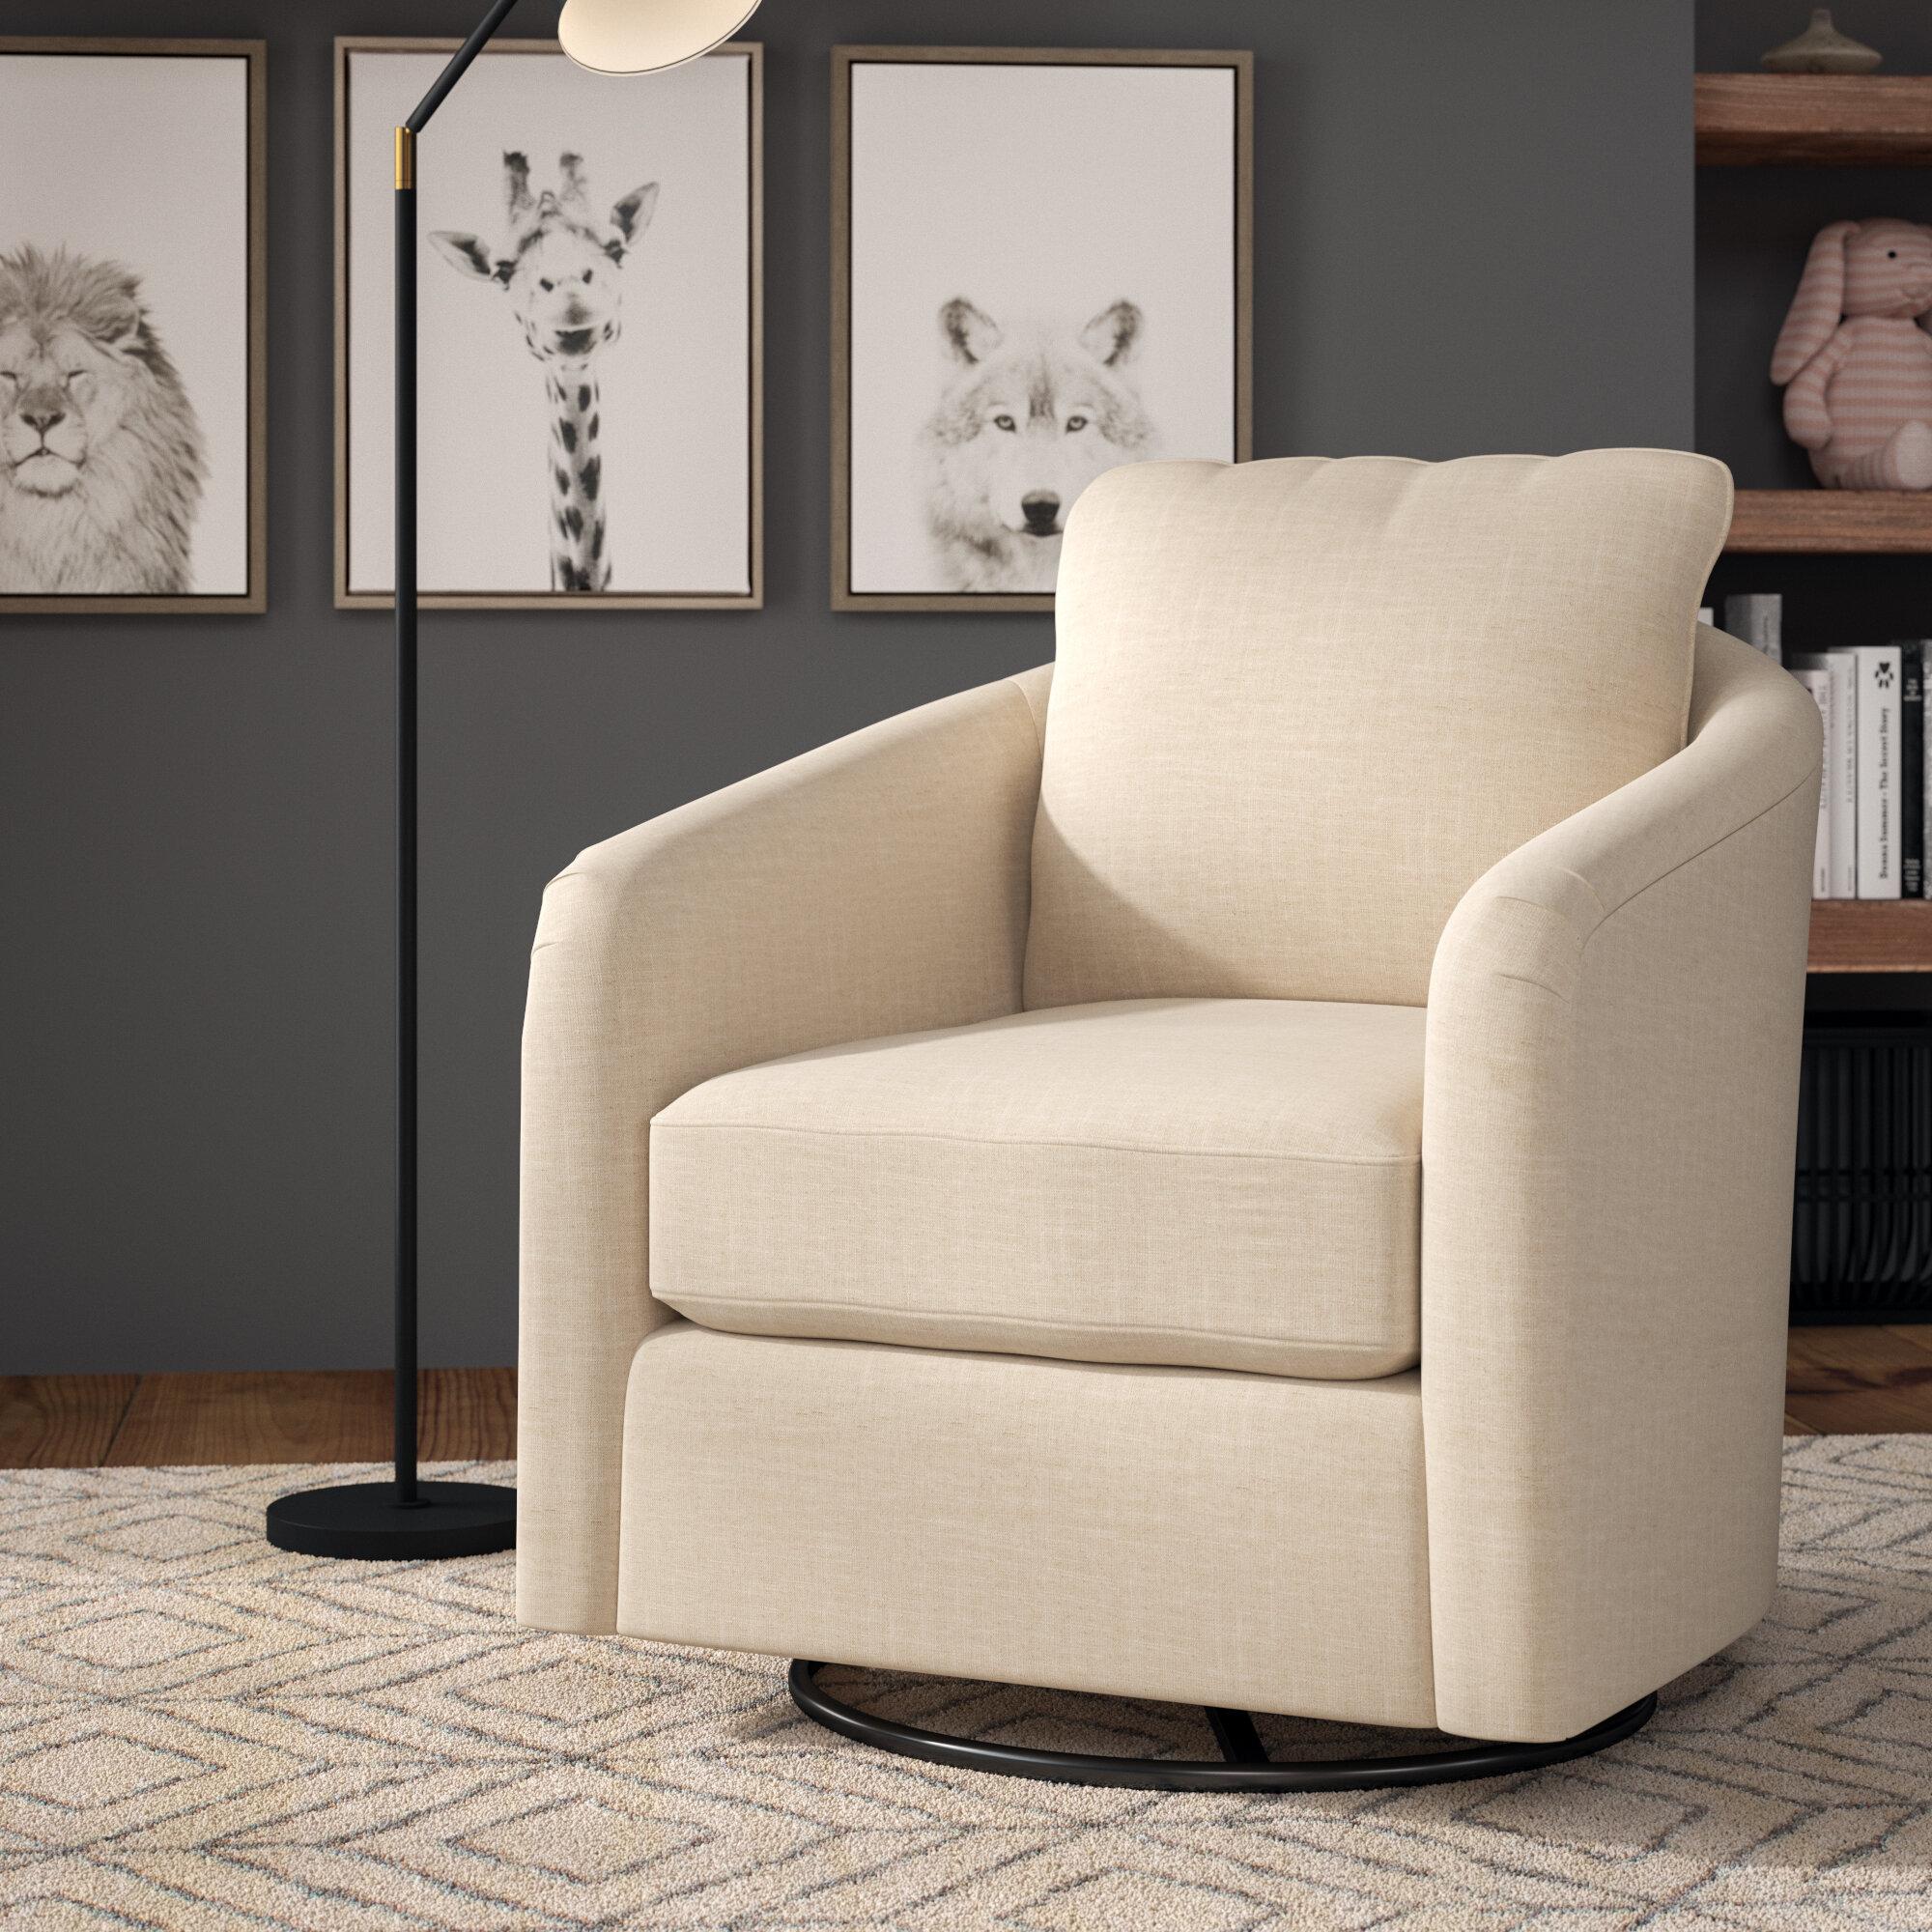 Marvelous Bartow Modern Swivel Glider Beatyapartments Chair Design Images Beatyapartmentscom